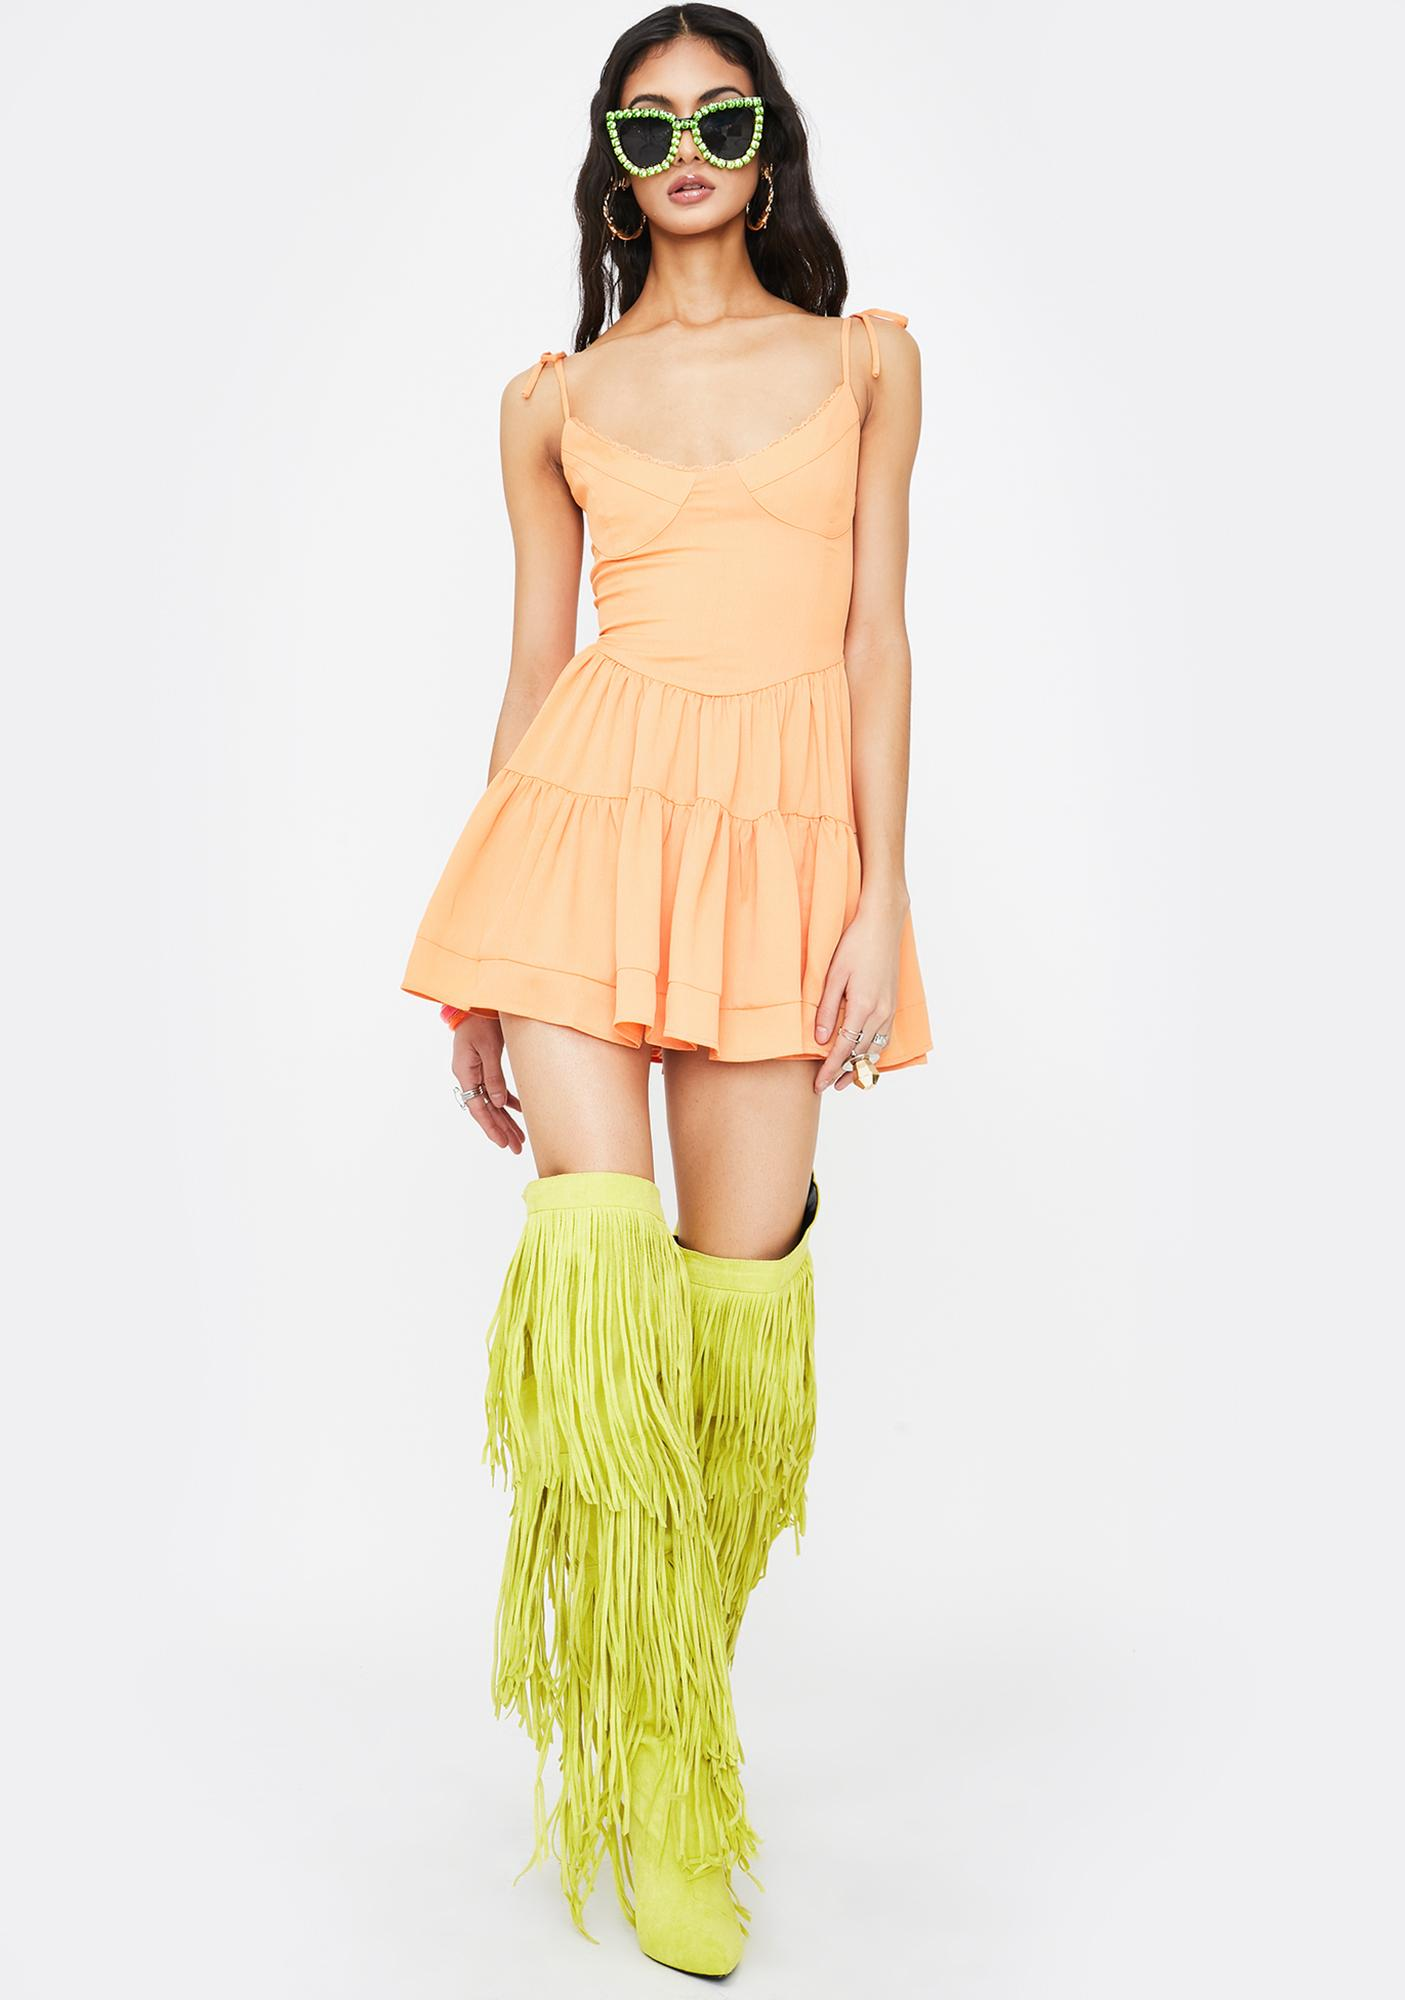 Tiger Mist Orange Bijou Mini Dress